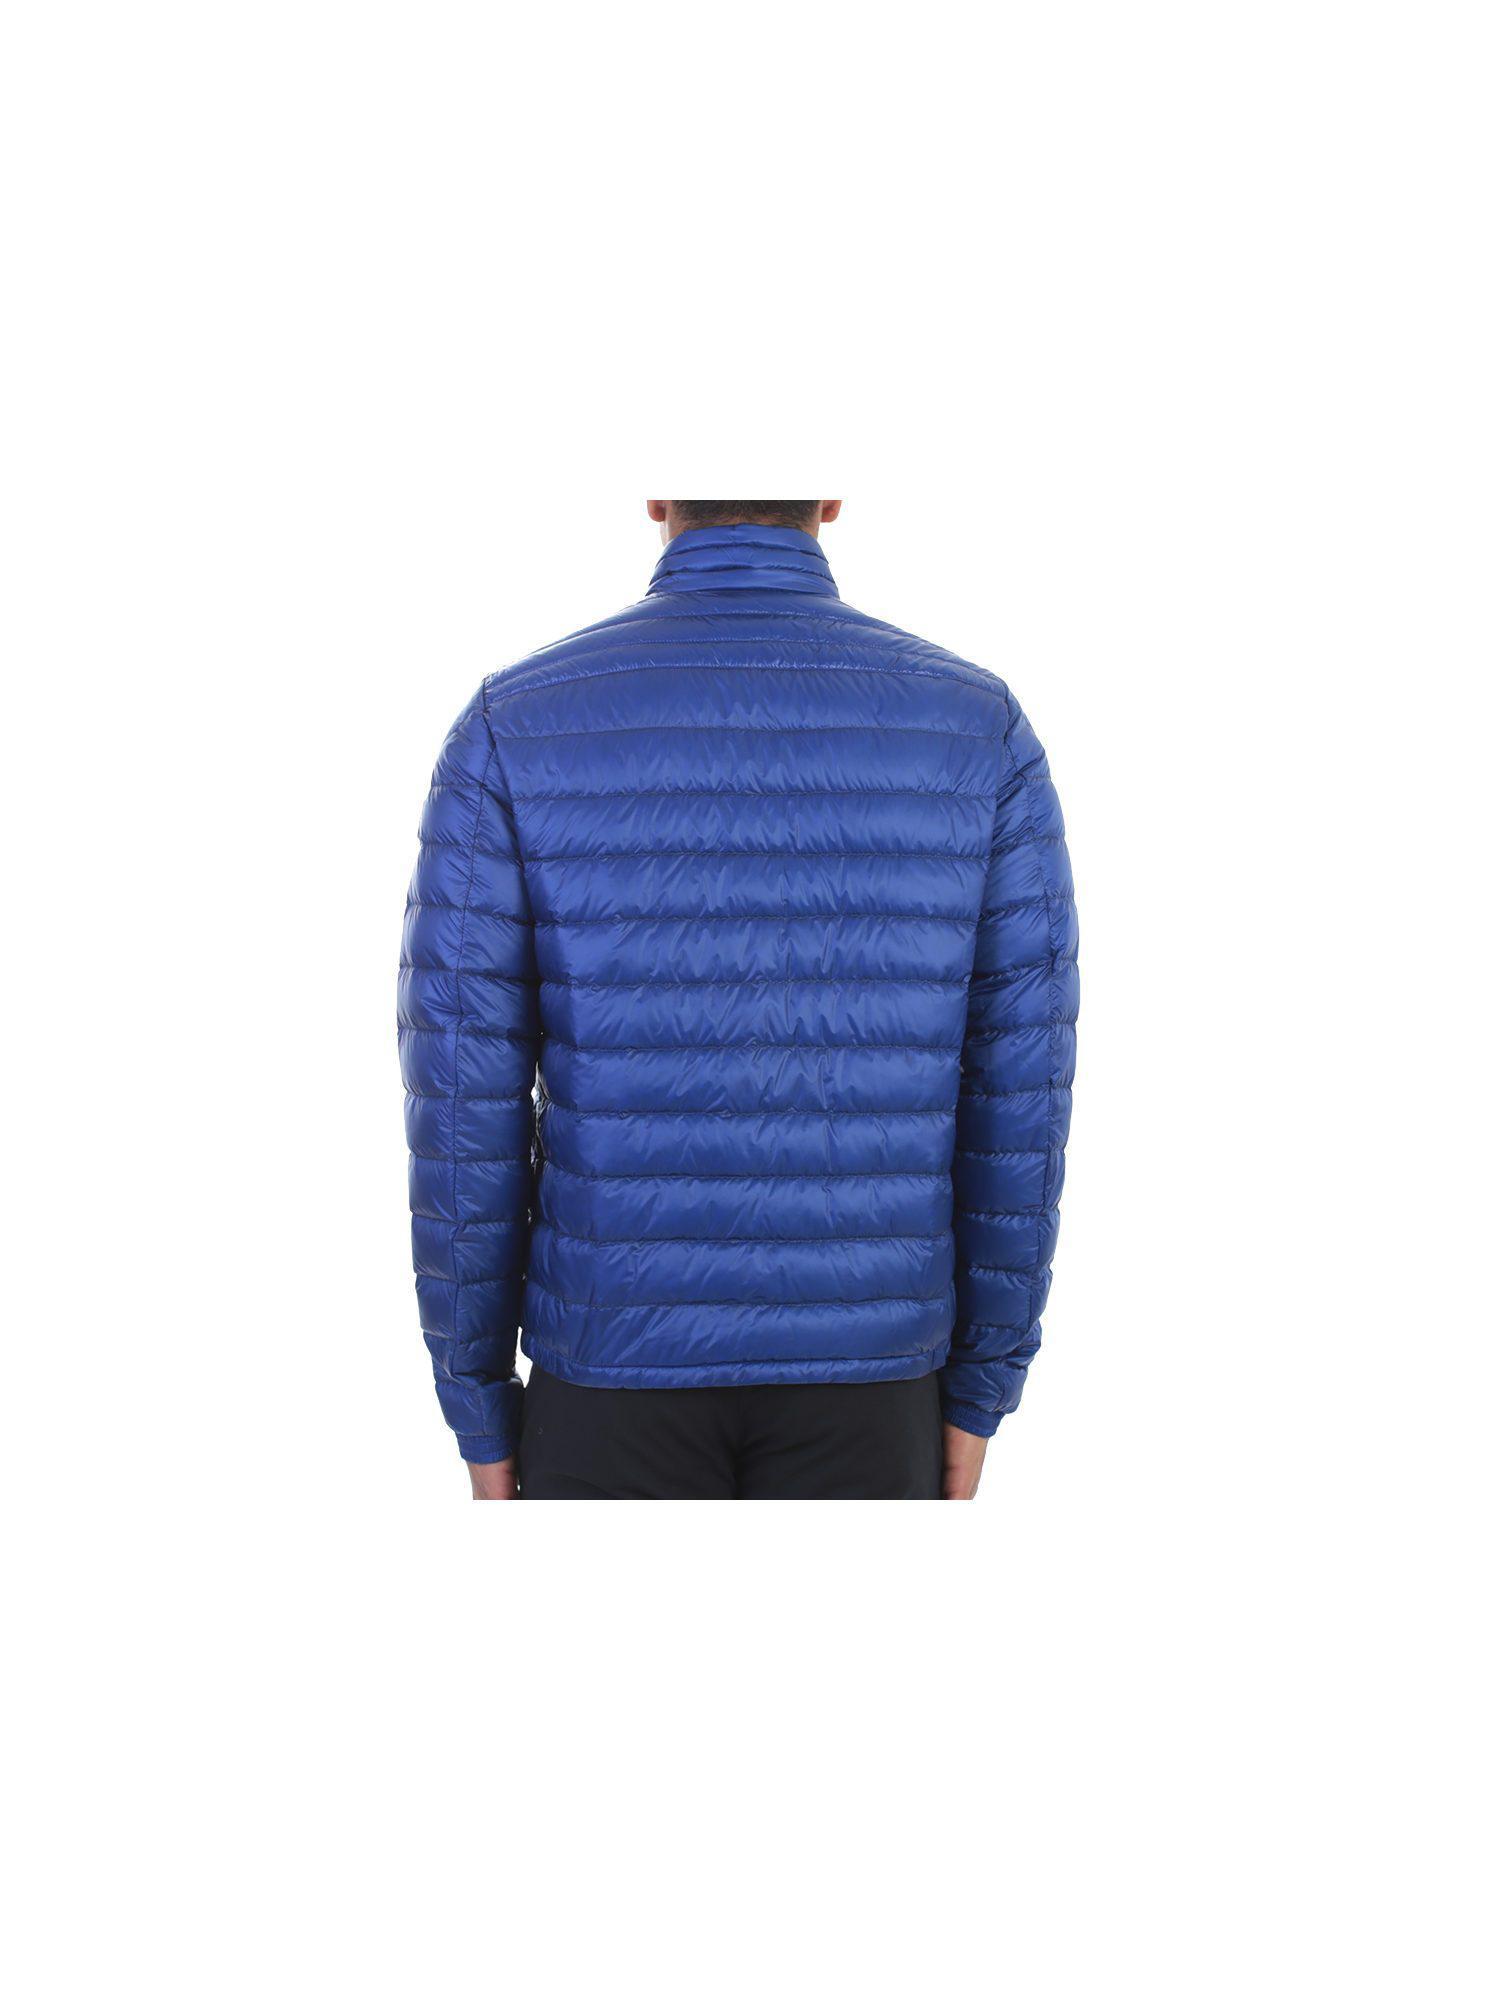 Moncler Synthetic Electric Blue Nylon Daniel Jacket for Men